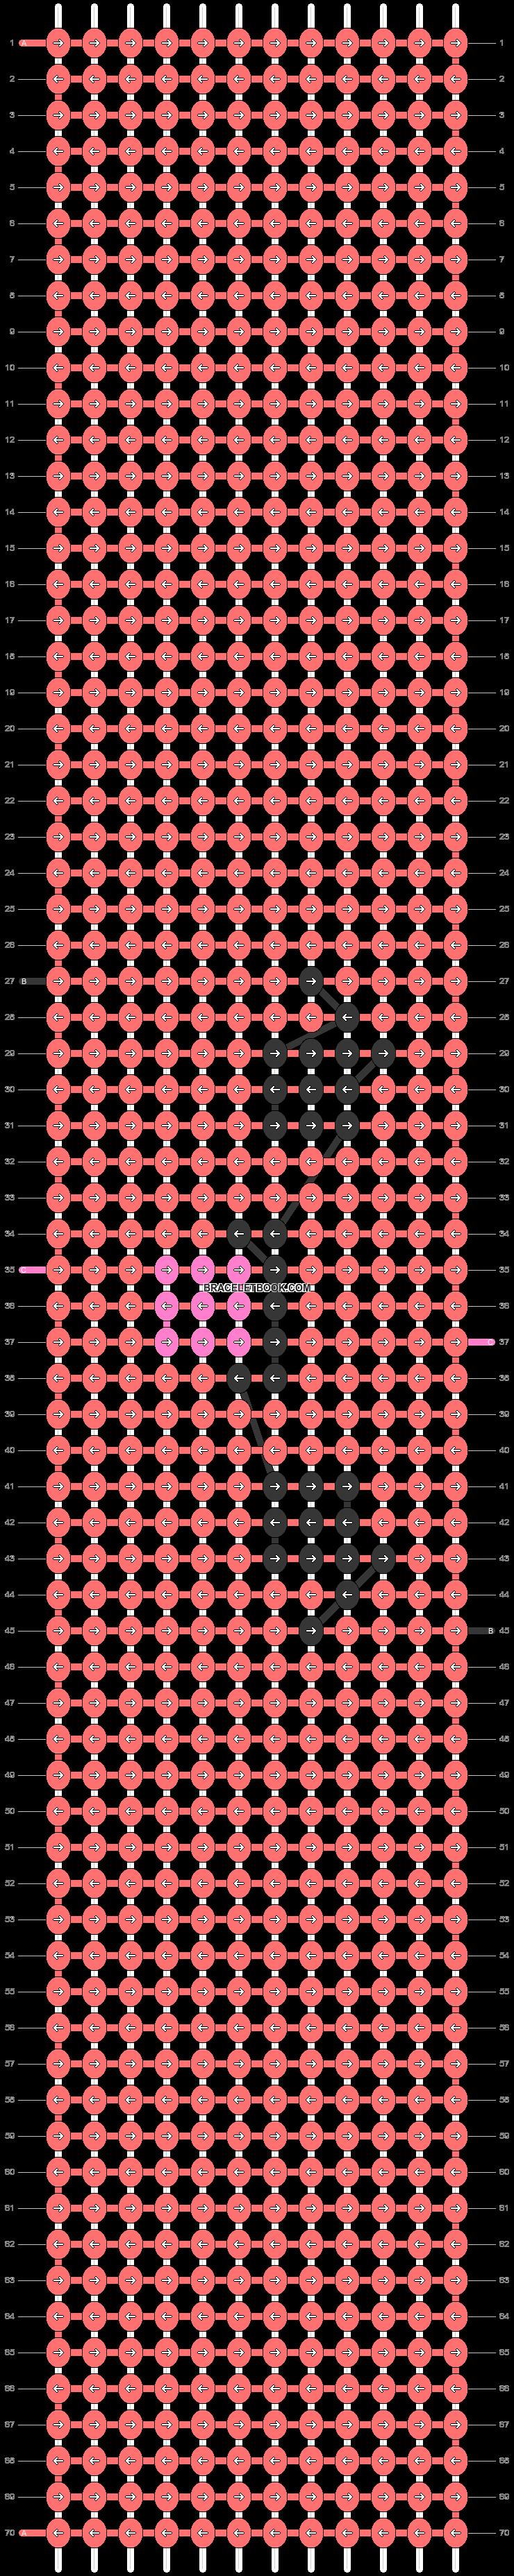 Alpha pattern #47957 pattern